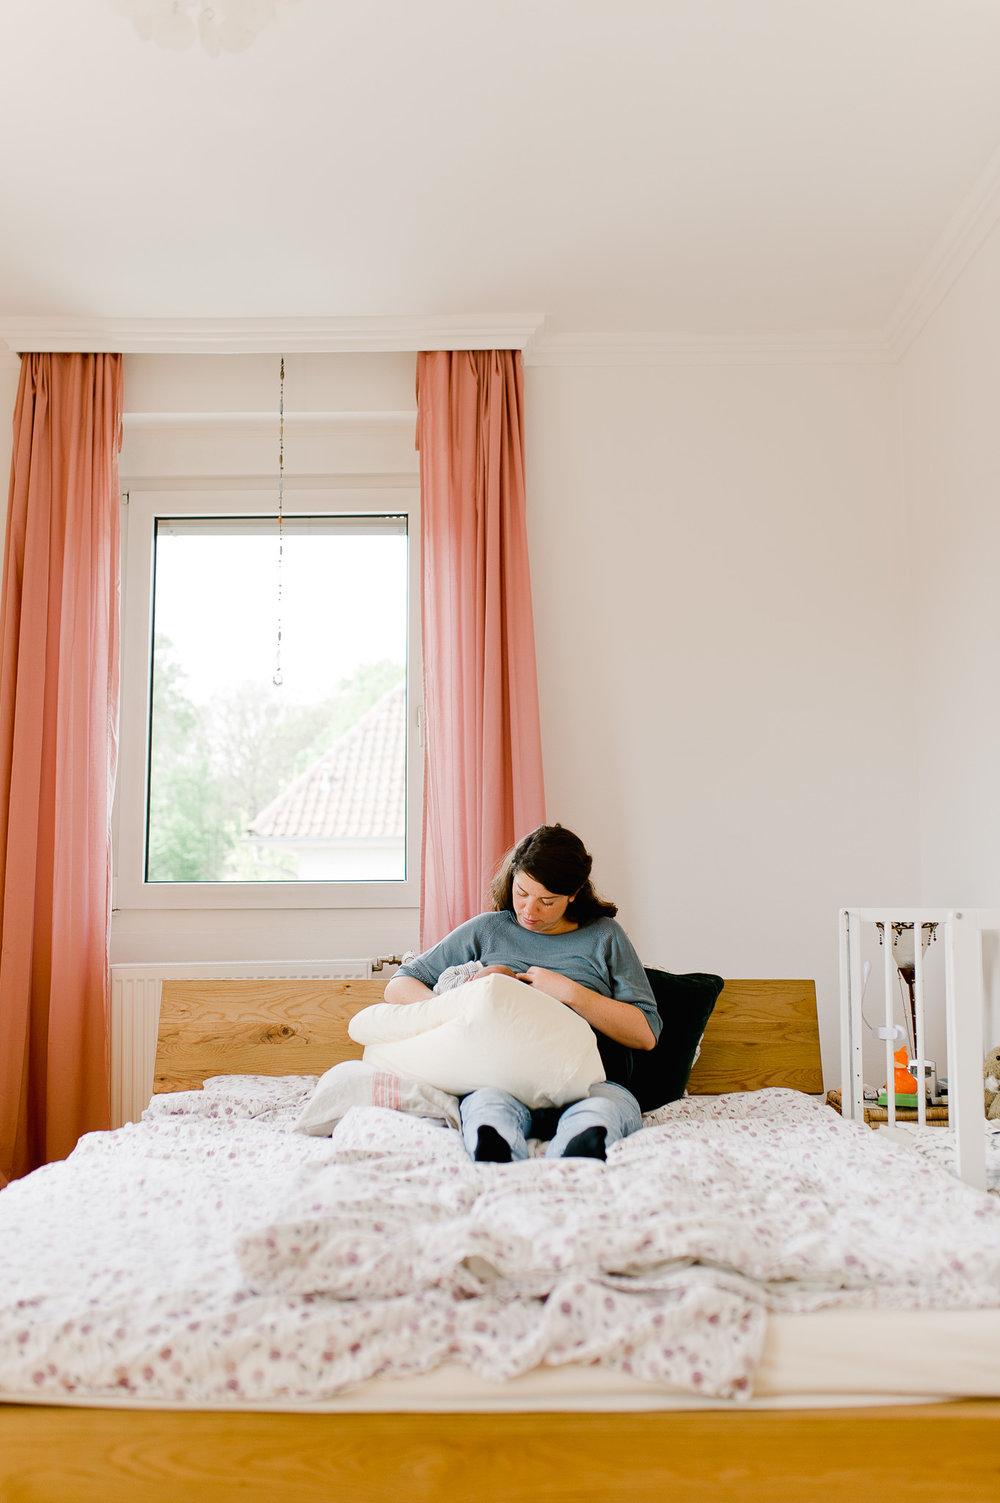 Anna-Hari-Photography-Familienshooting-Mannheim-21.jpg